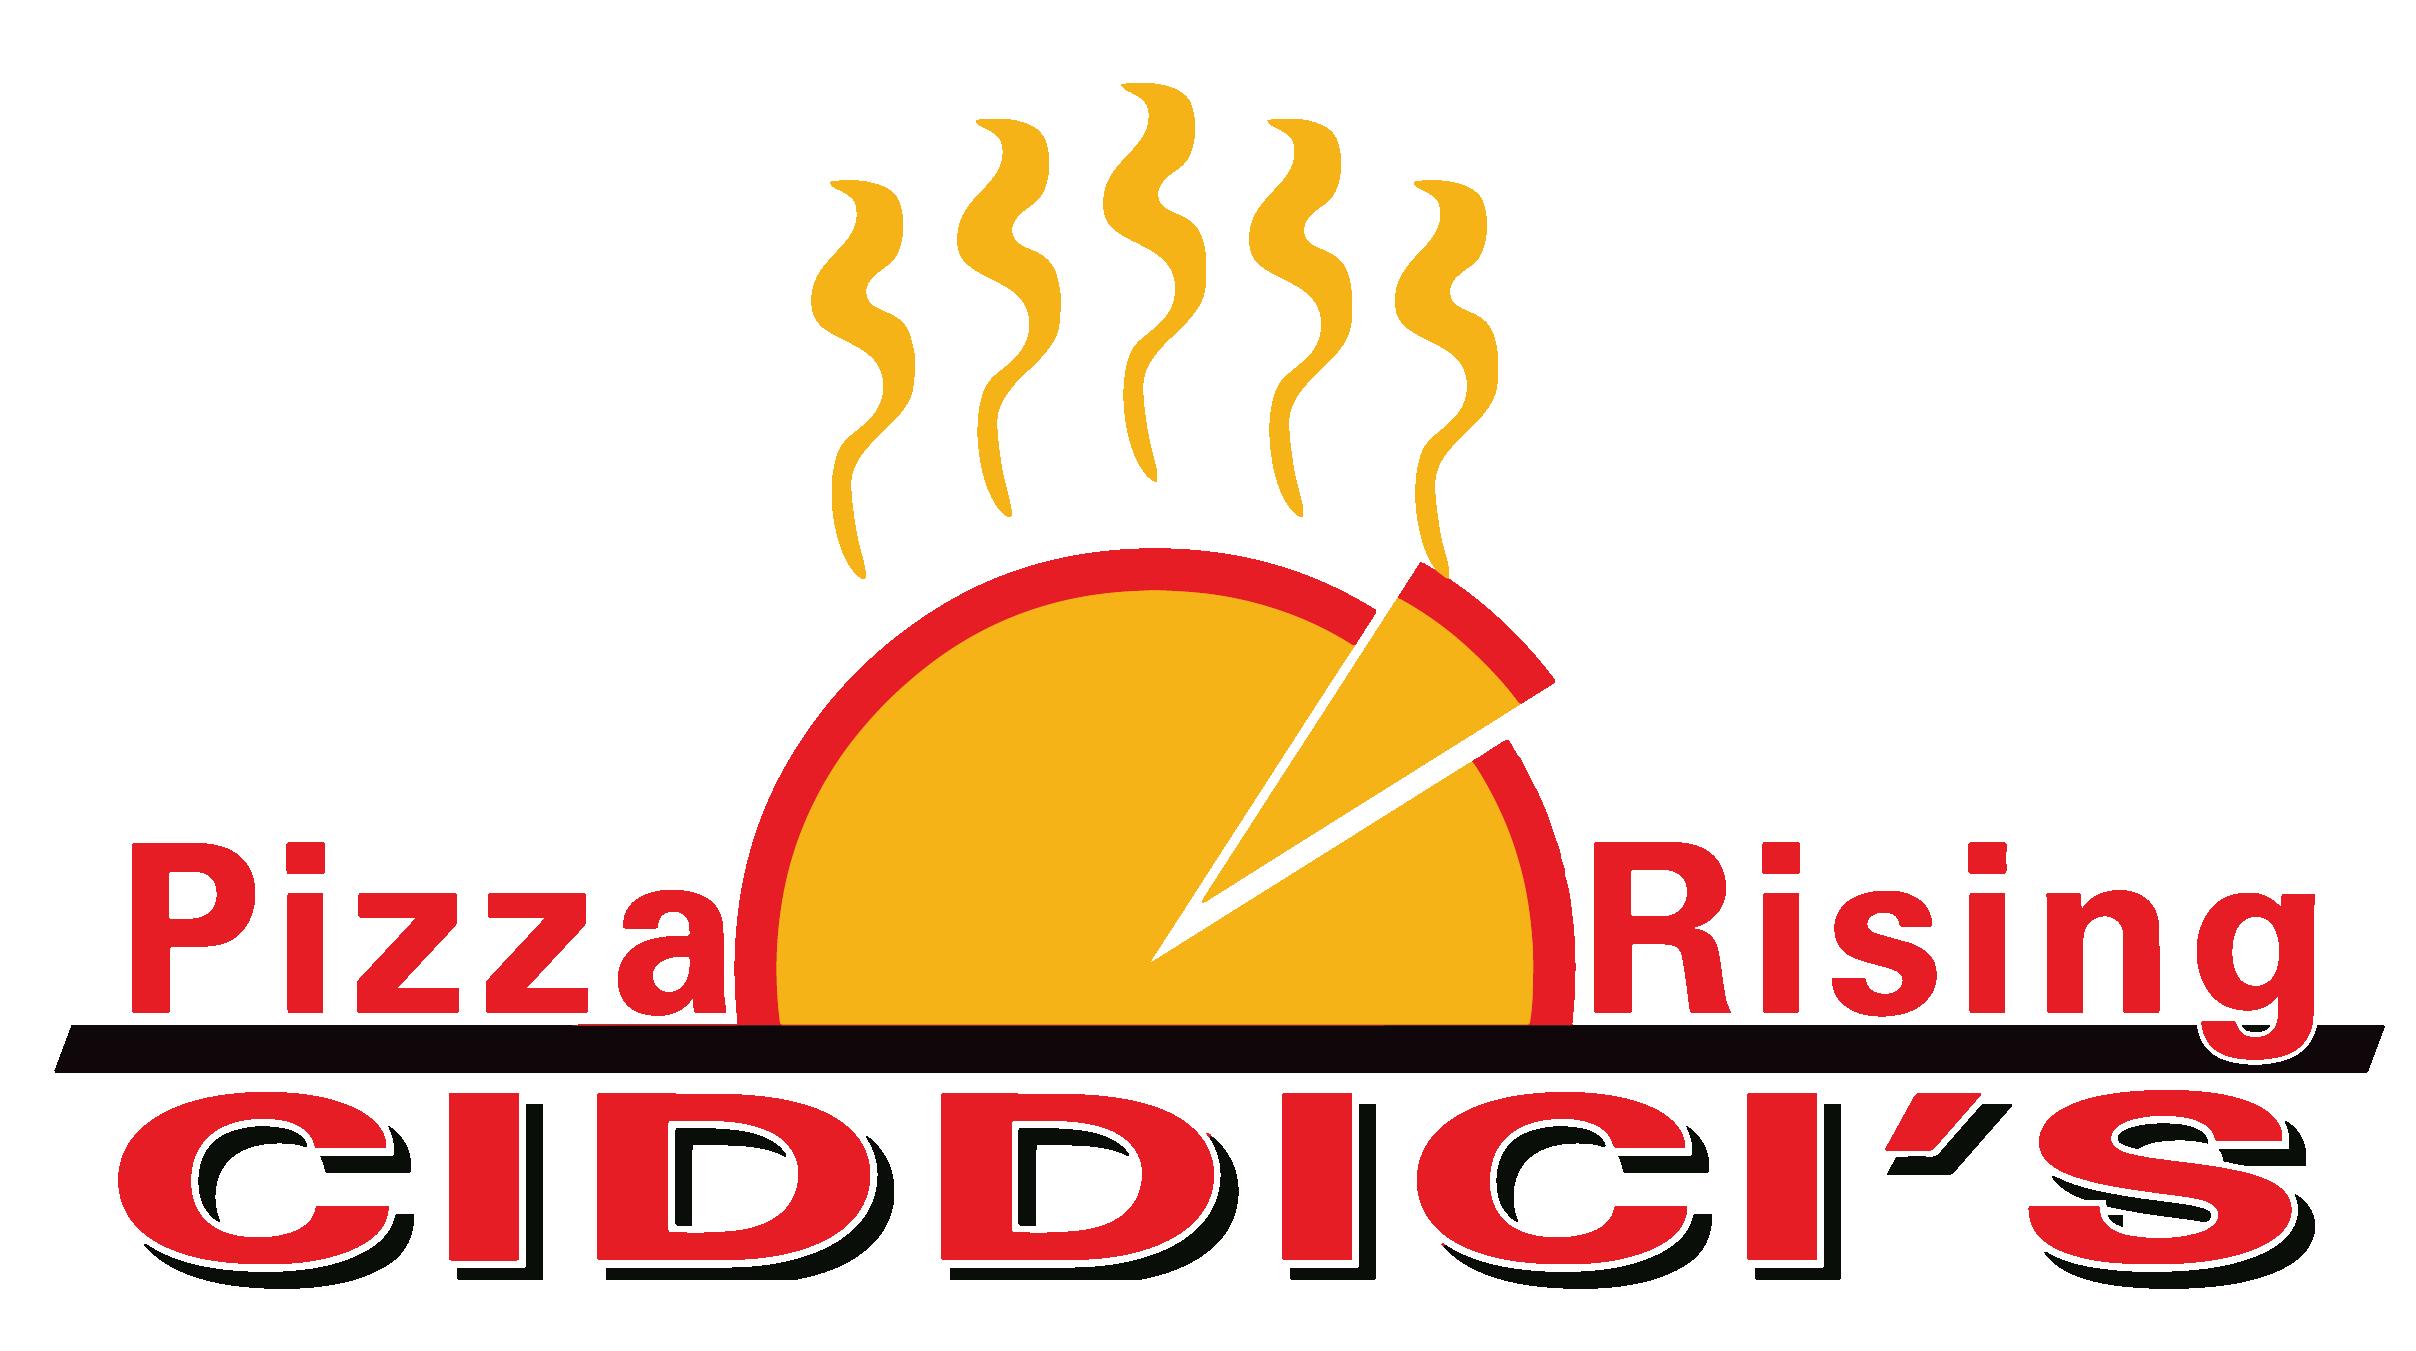 Ciddici's Pizza